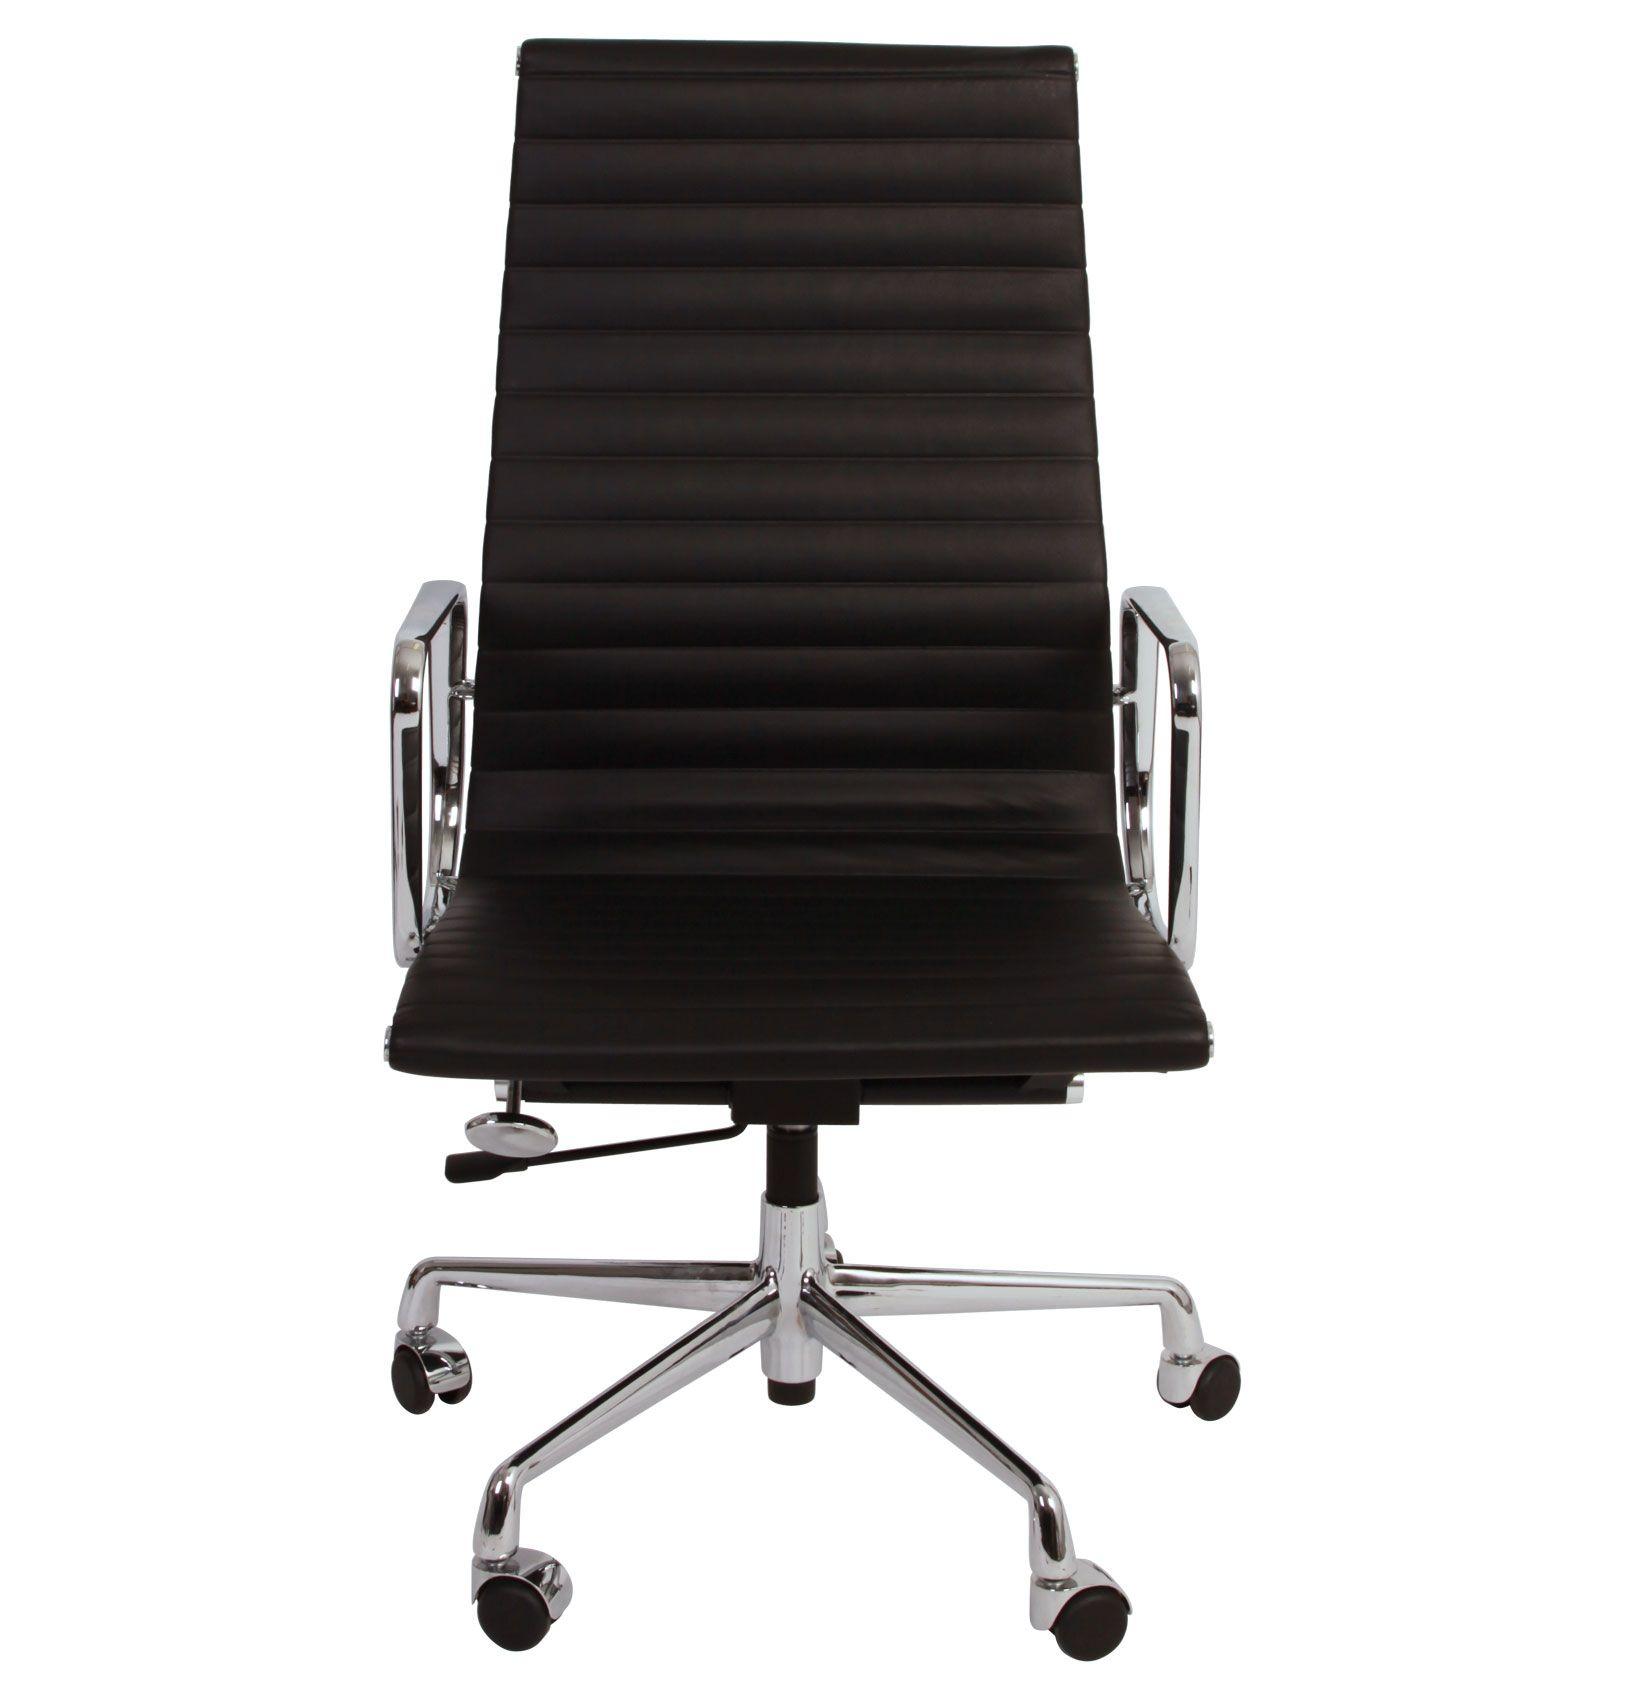 Explore Executive Chair, Office Chairs, And More! The Matt Blatt Replica  Eames Group Aluminium ...